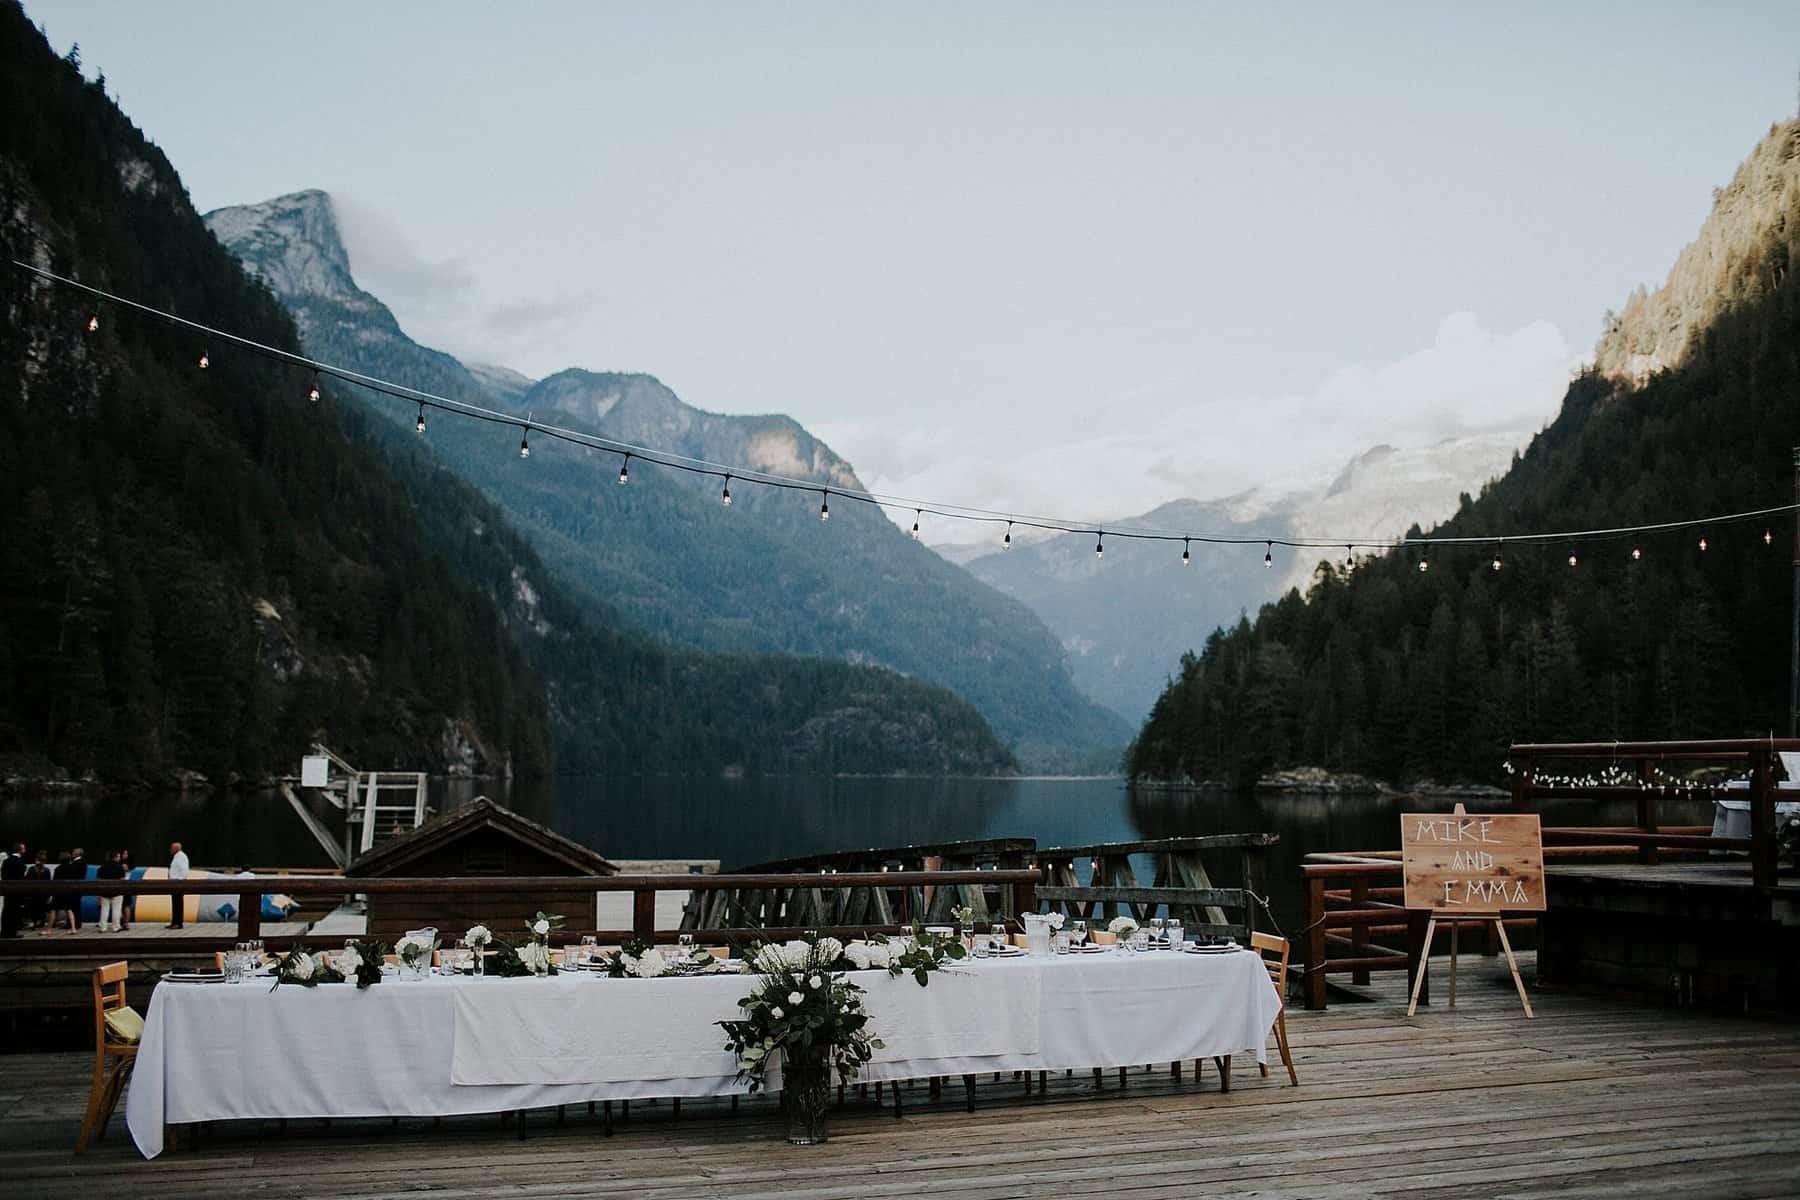 malibu-british-columbia-canada-pacific-northwest-wedding-0048